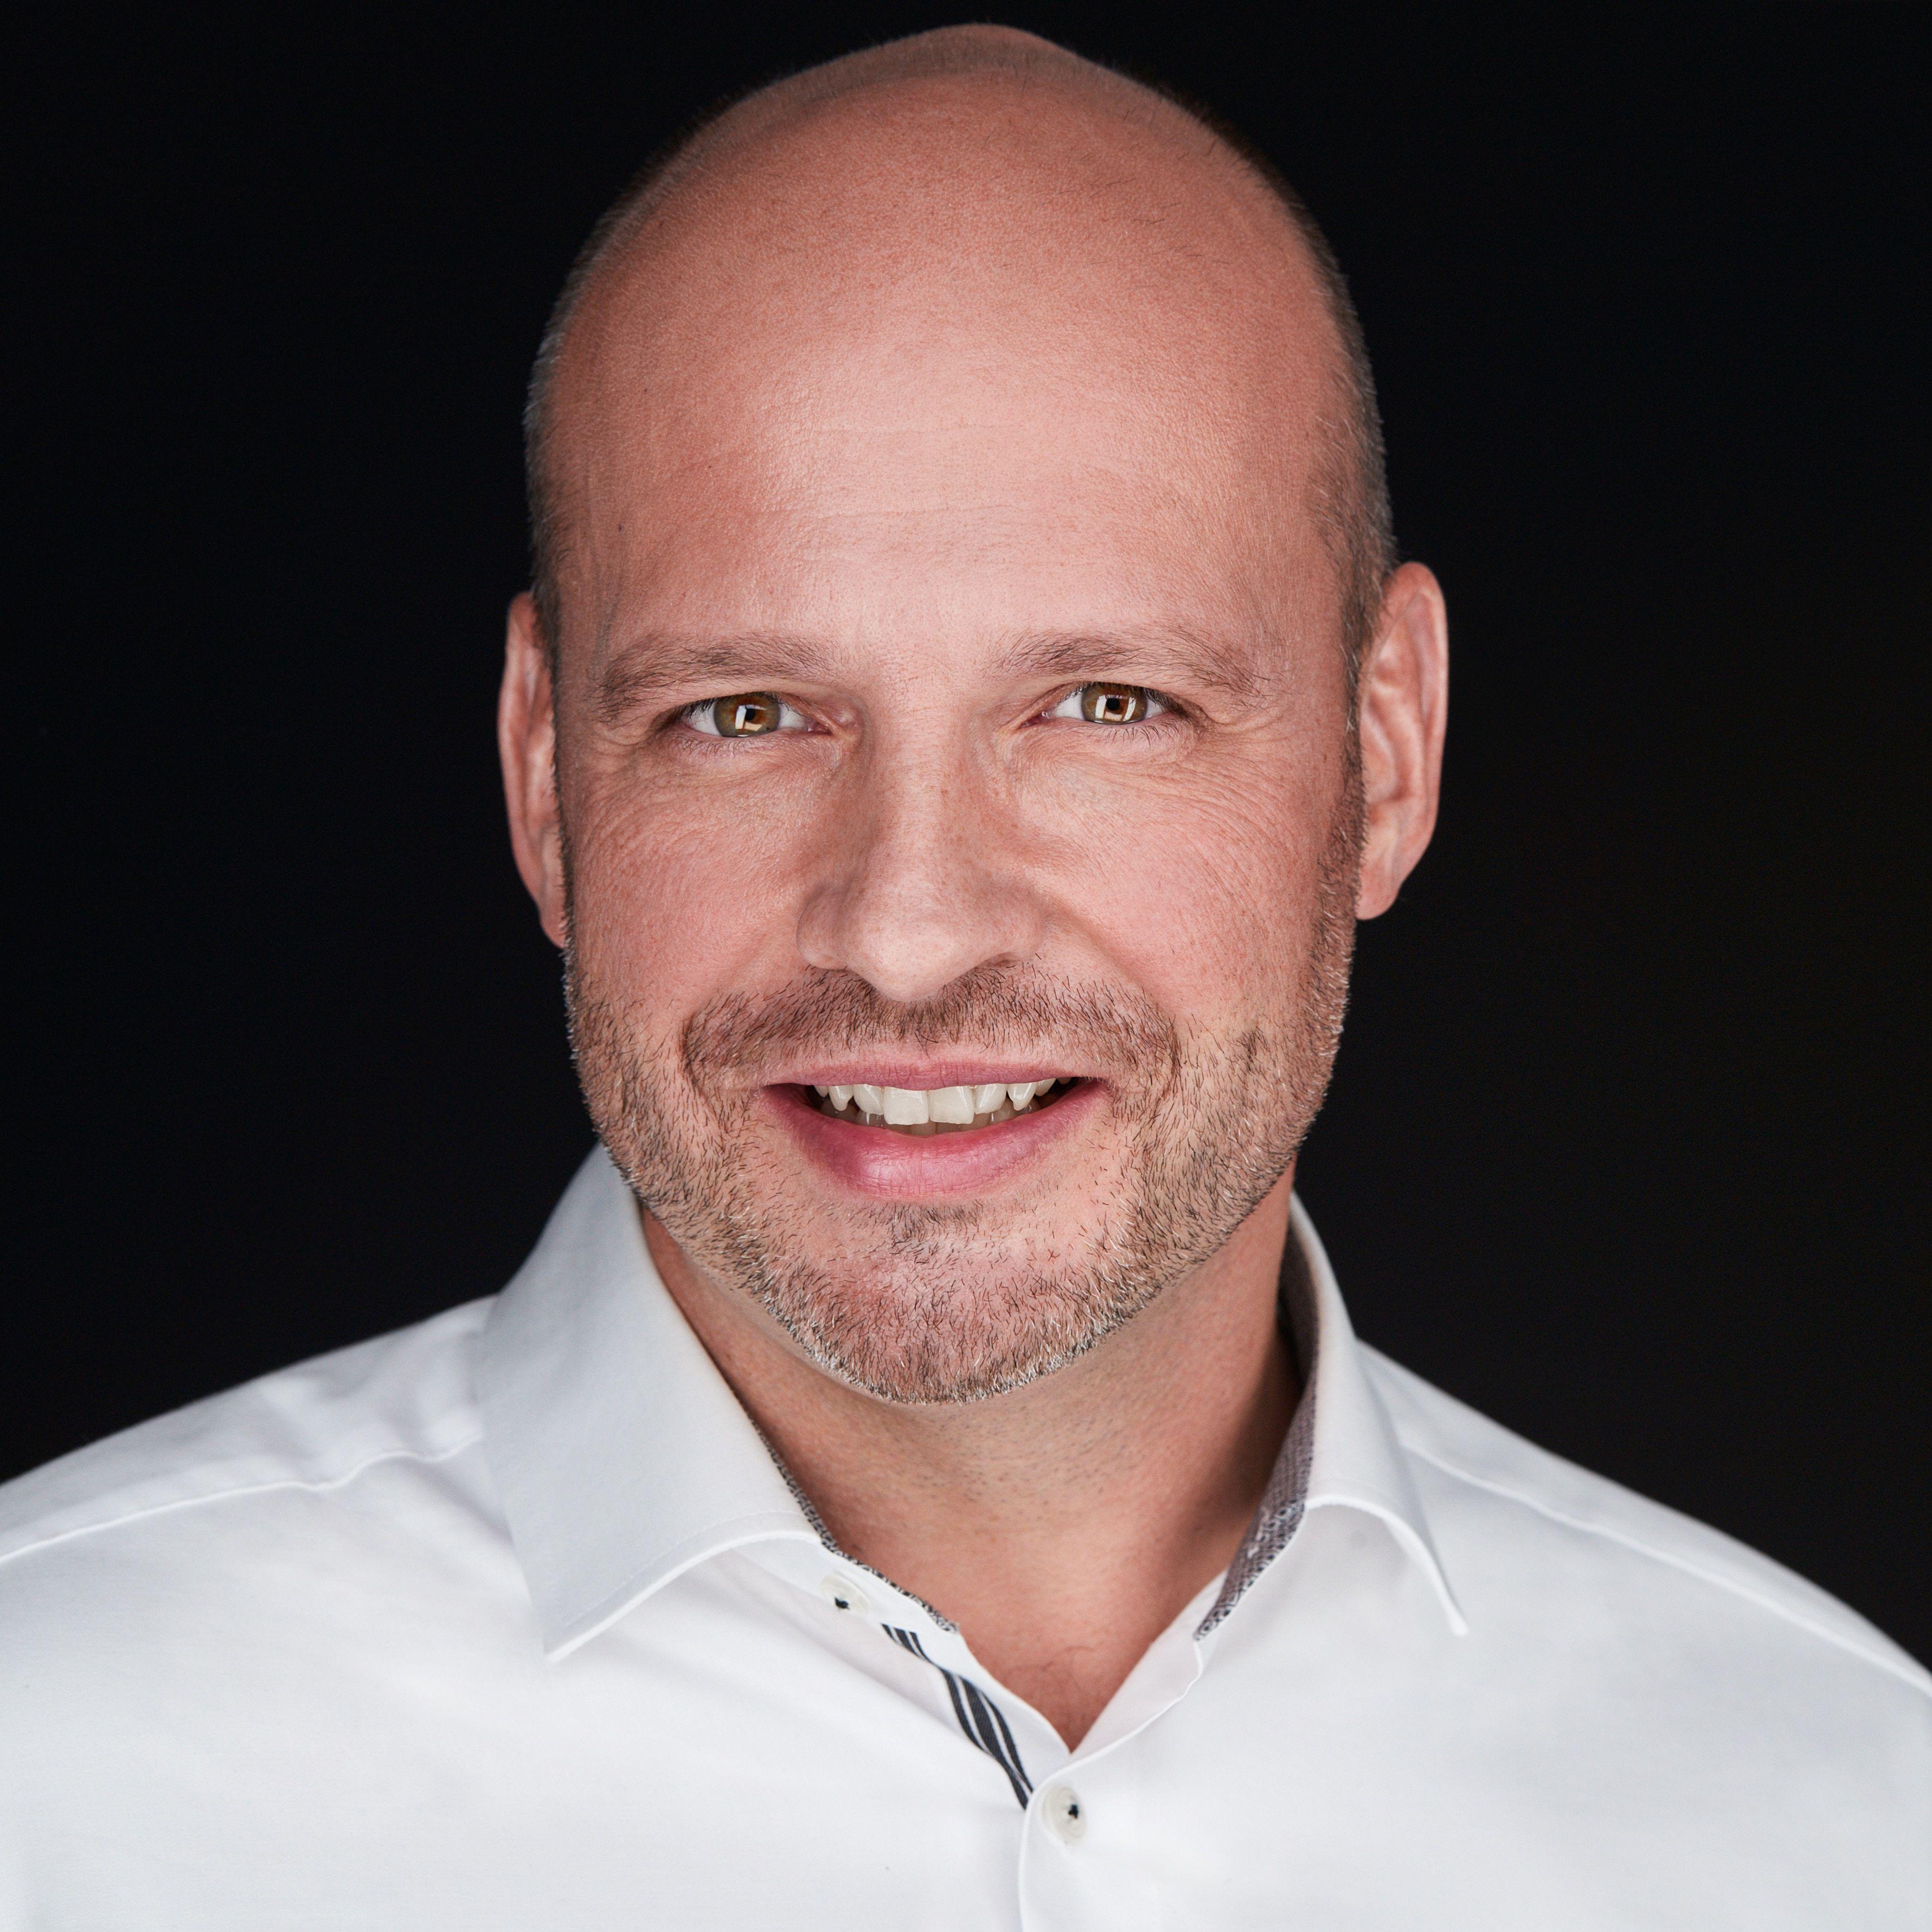 Avatar - Joerg Bruch